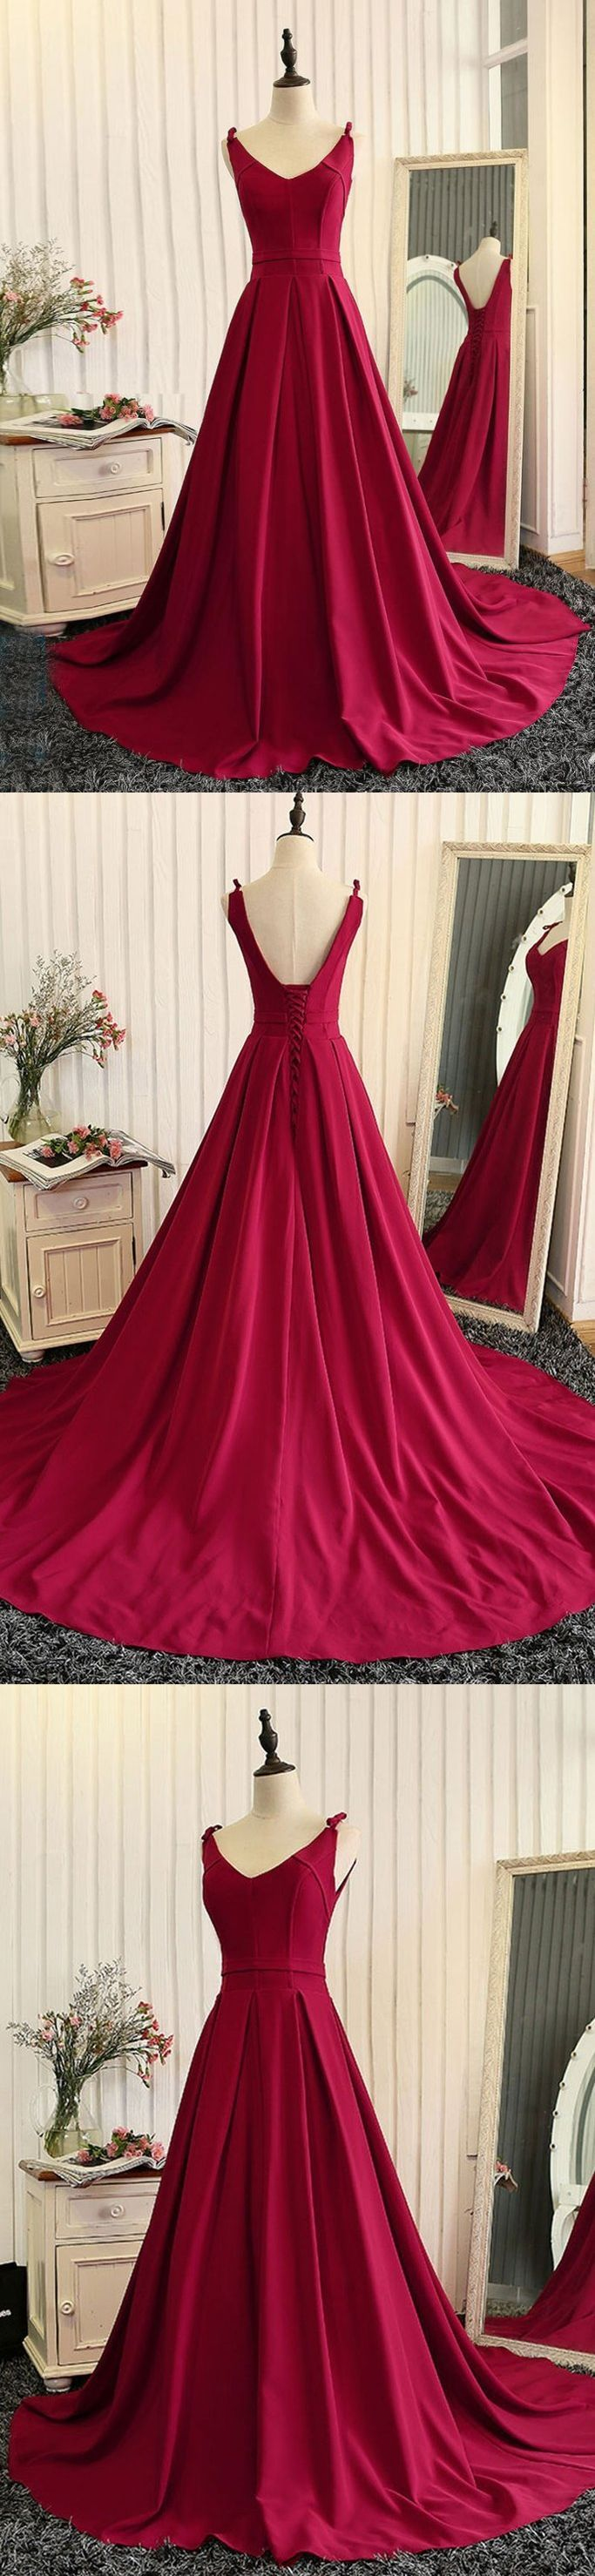 Promdresseslong cute cloths pinterest short prom dresses